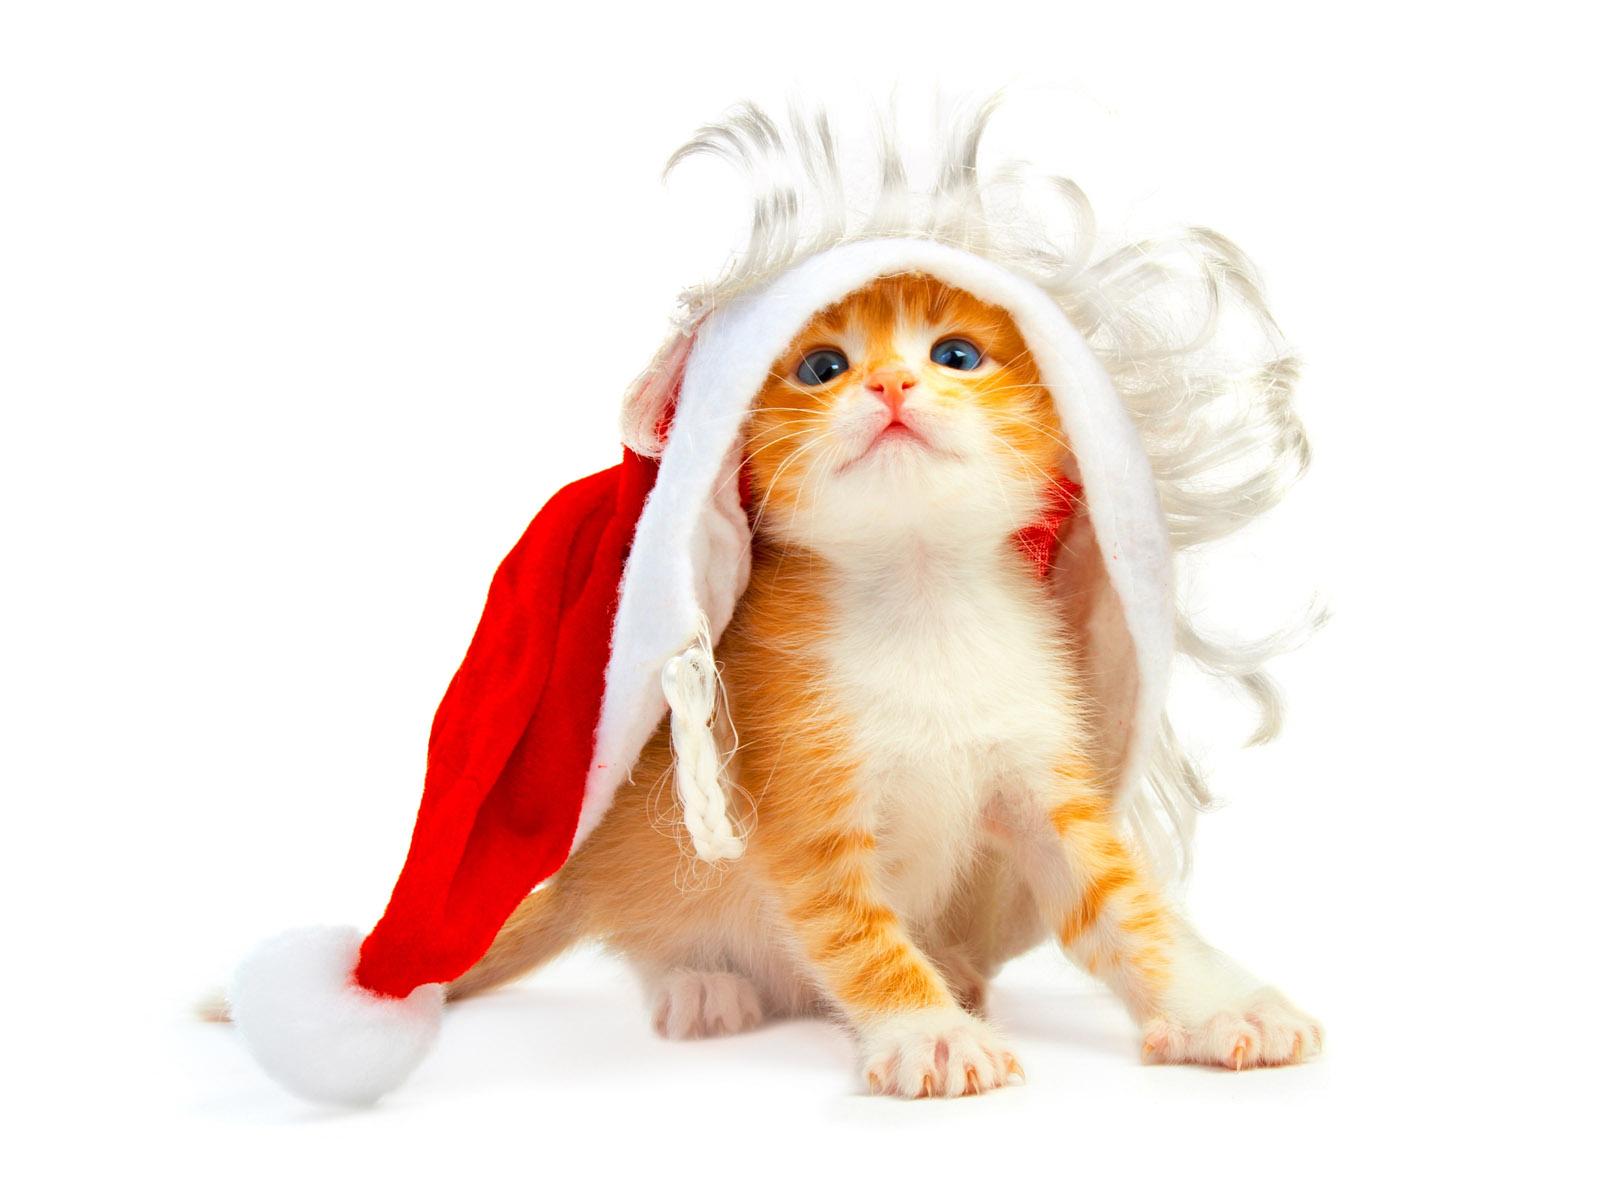 Cute christmas animals - photo#2